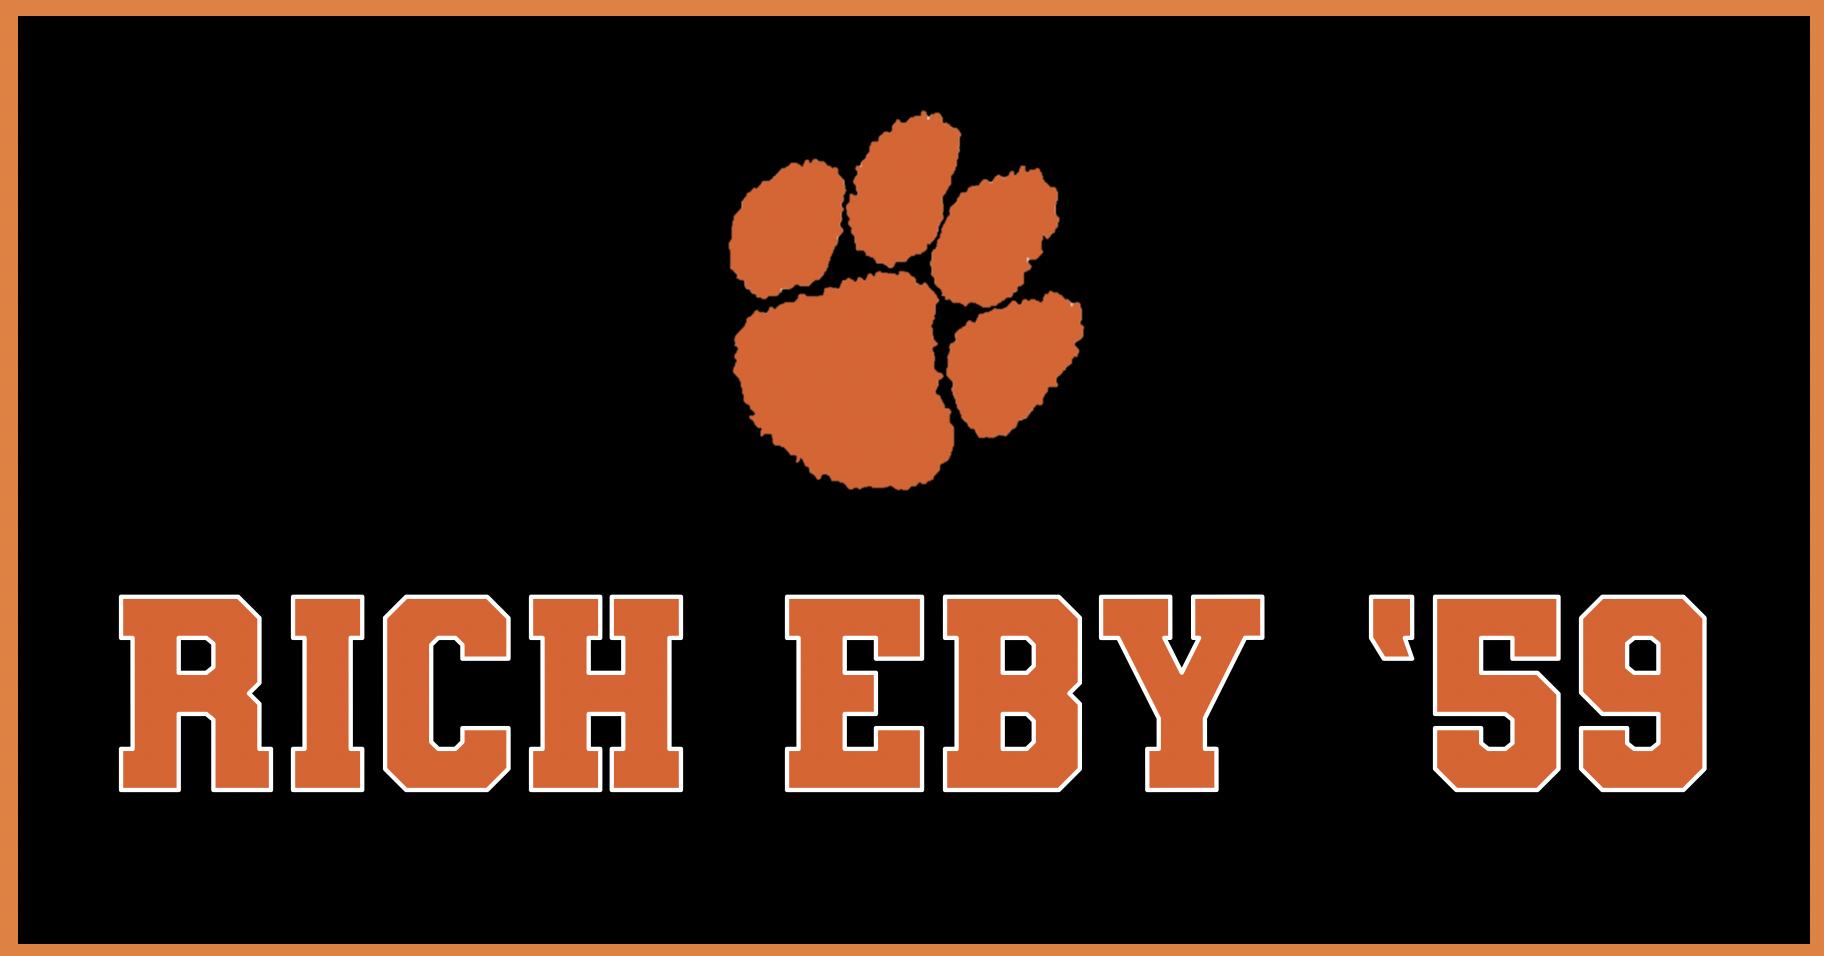 Birdie Sponsor - Rich Eby, 59 - Logo